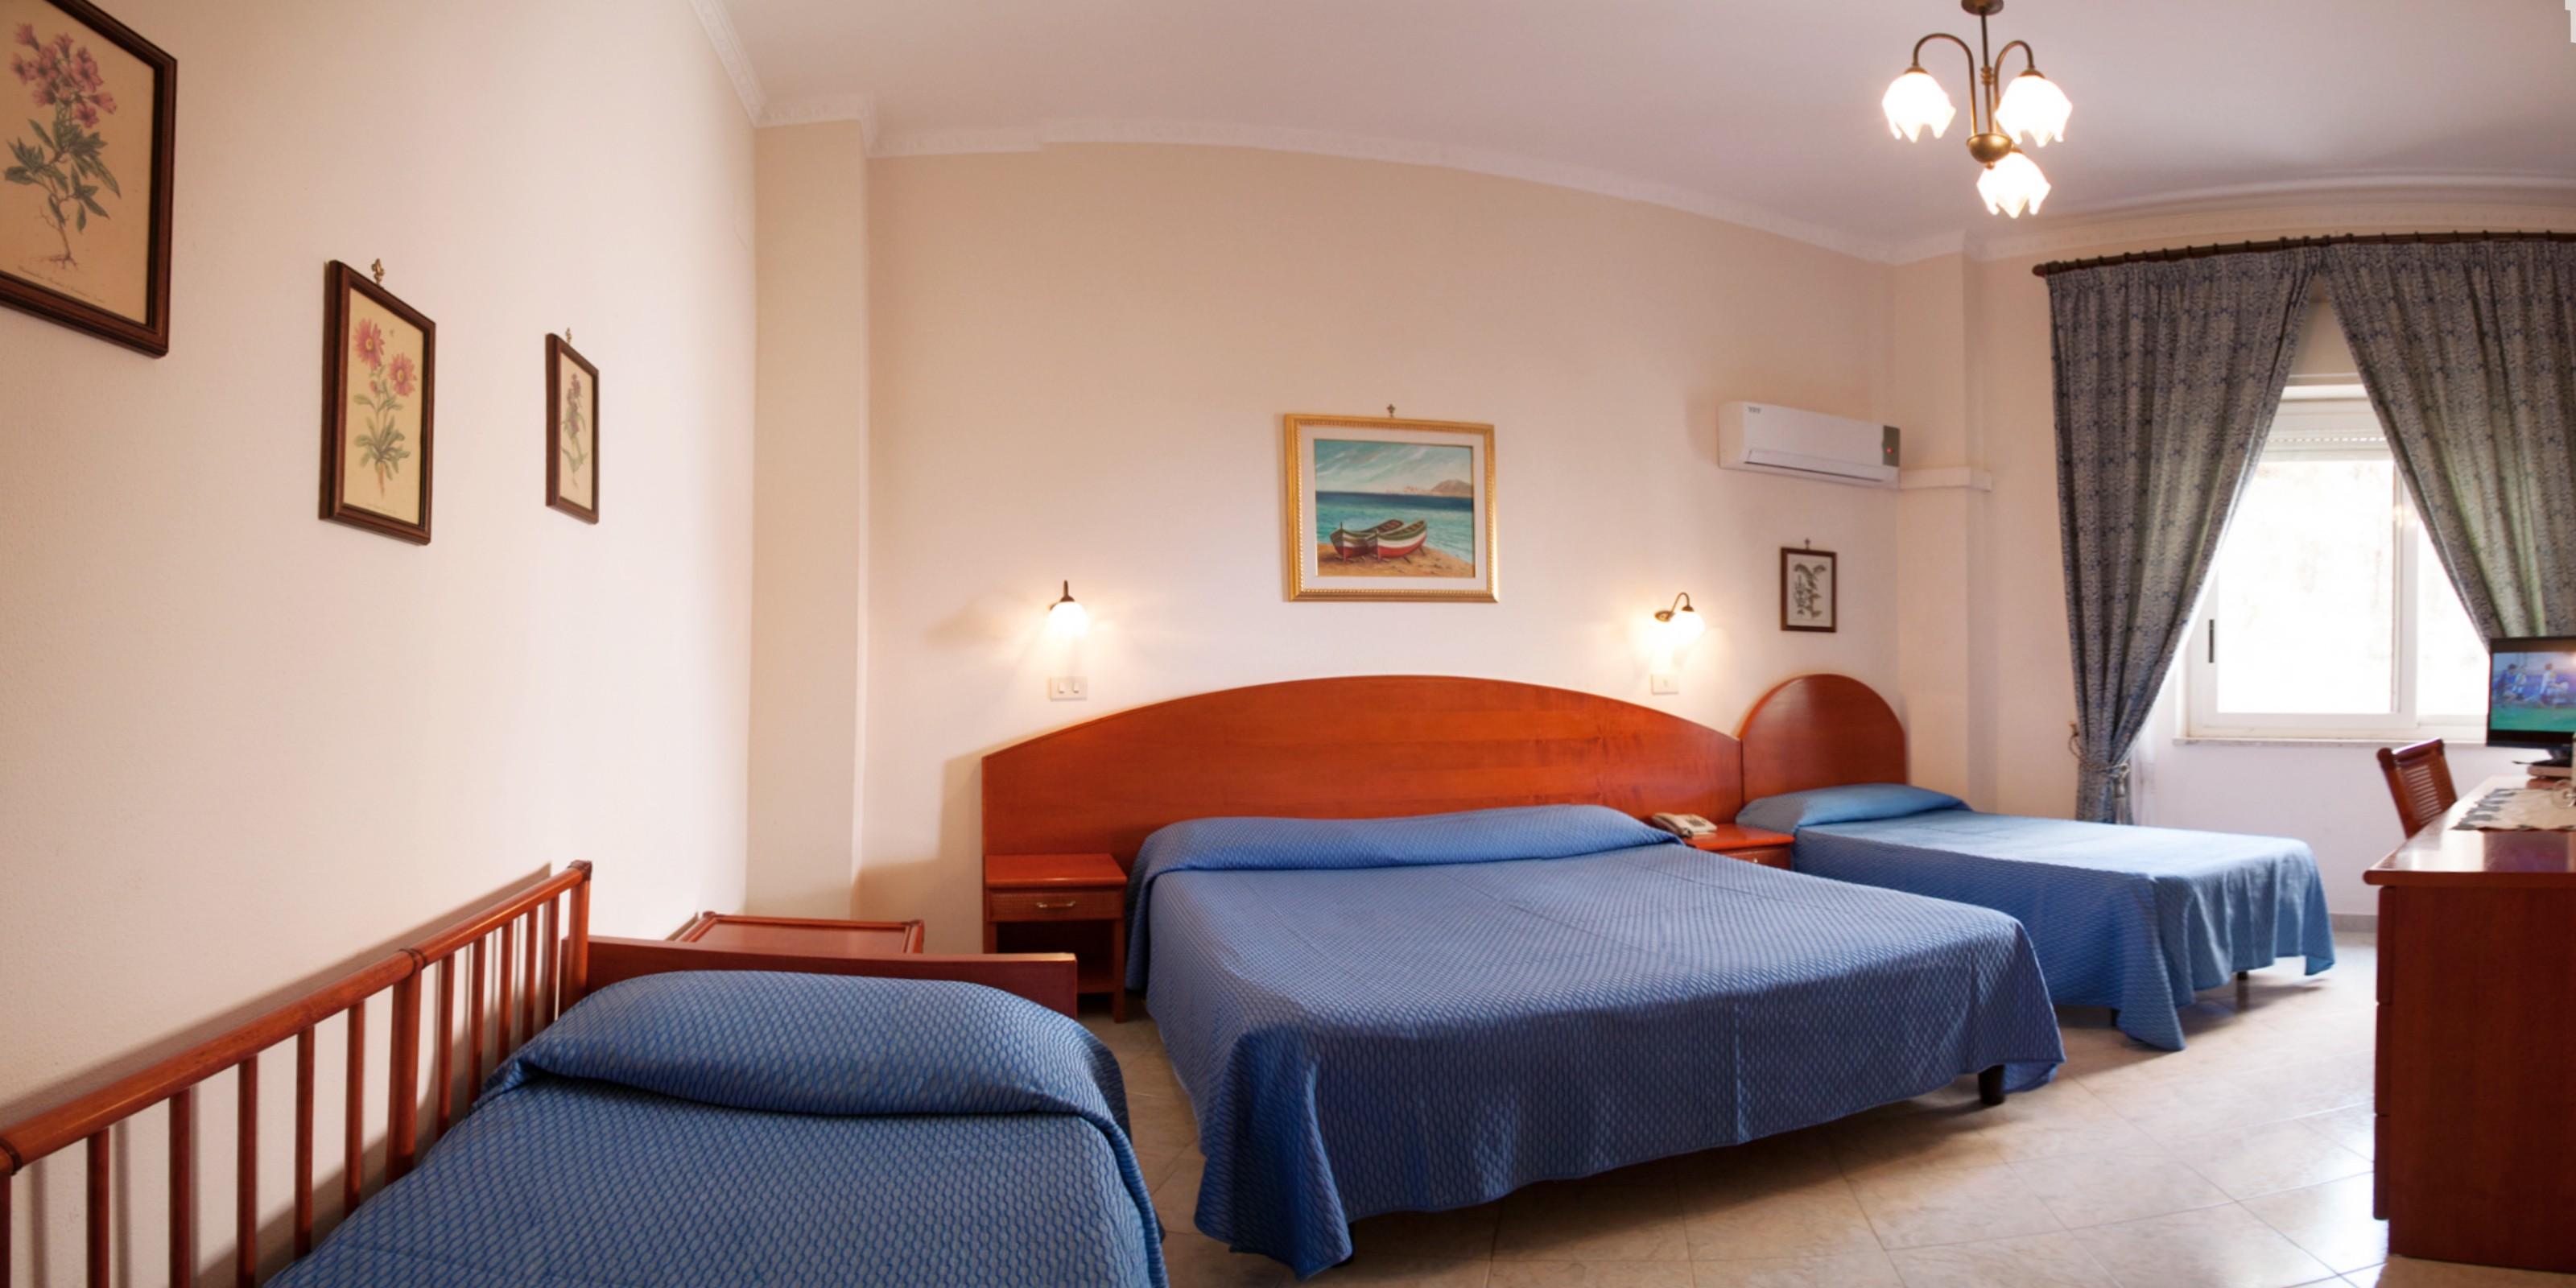 hotel mediterraneo cefalu : cefalù : sicile tyrrhénienne : sicile